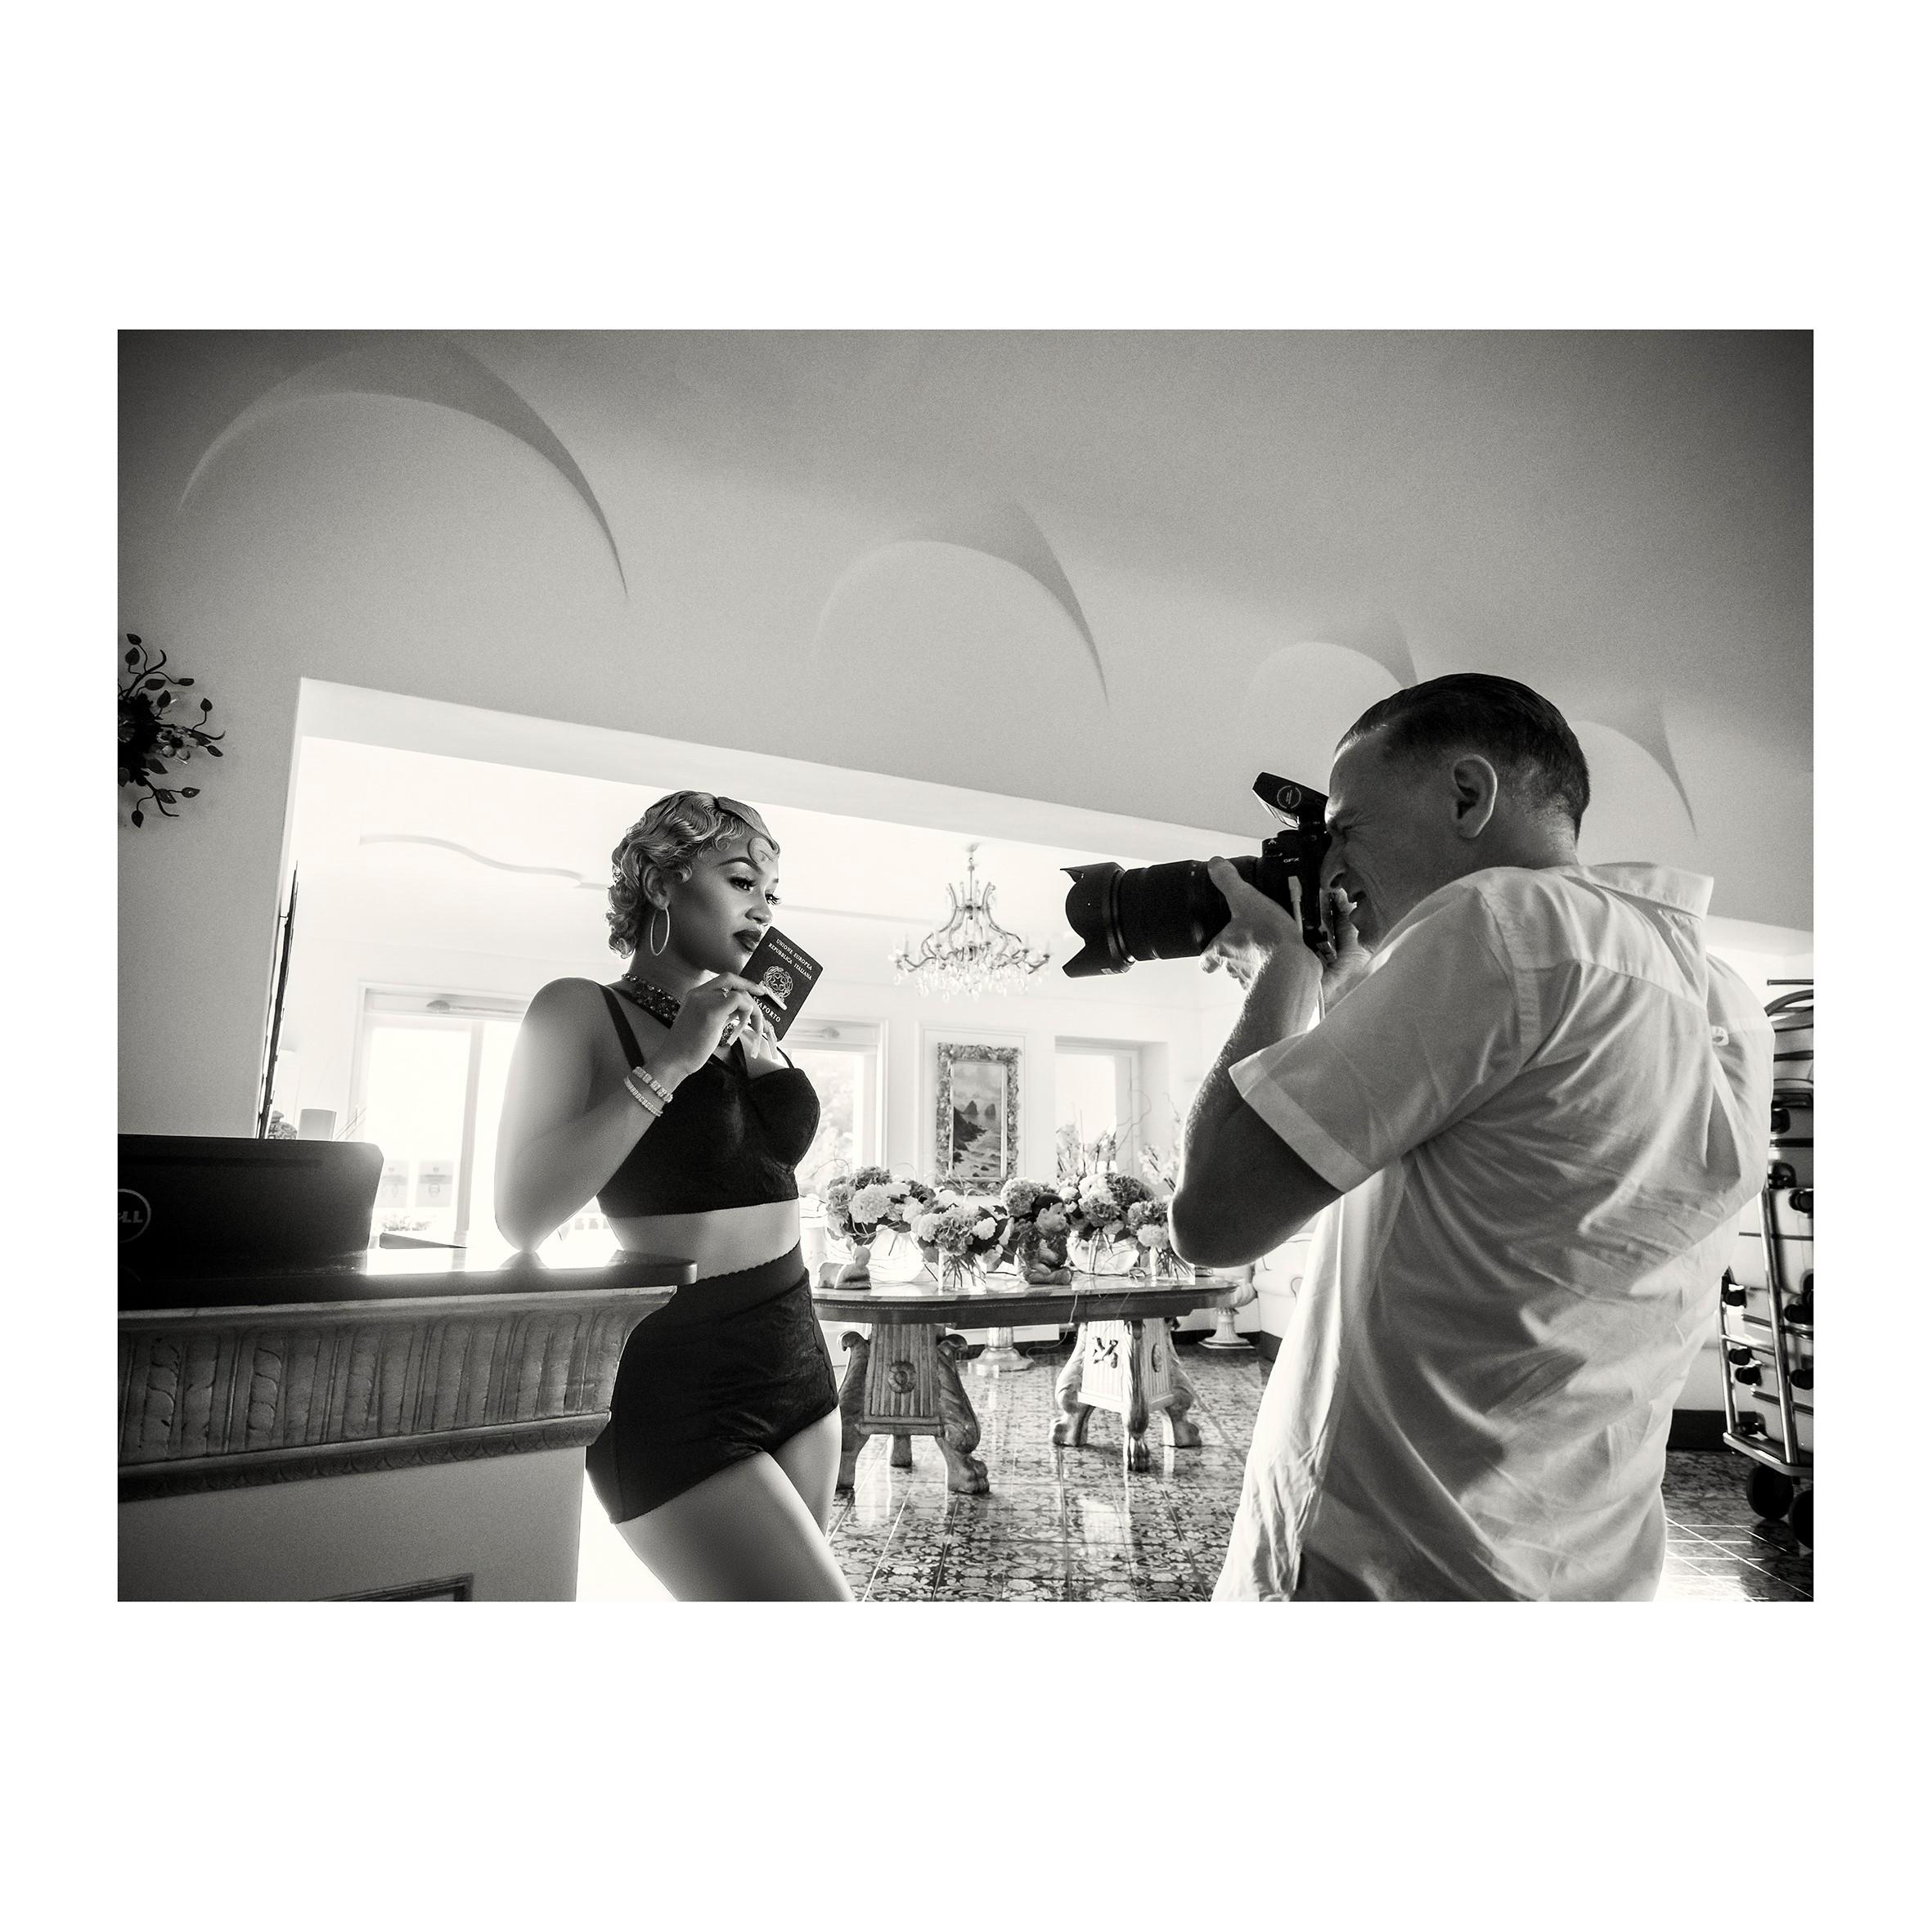 Saweetie nos bastidores do Calendário Pirelli 2022, de Bryan Adams (Foto: Alessandro Scotti)